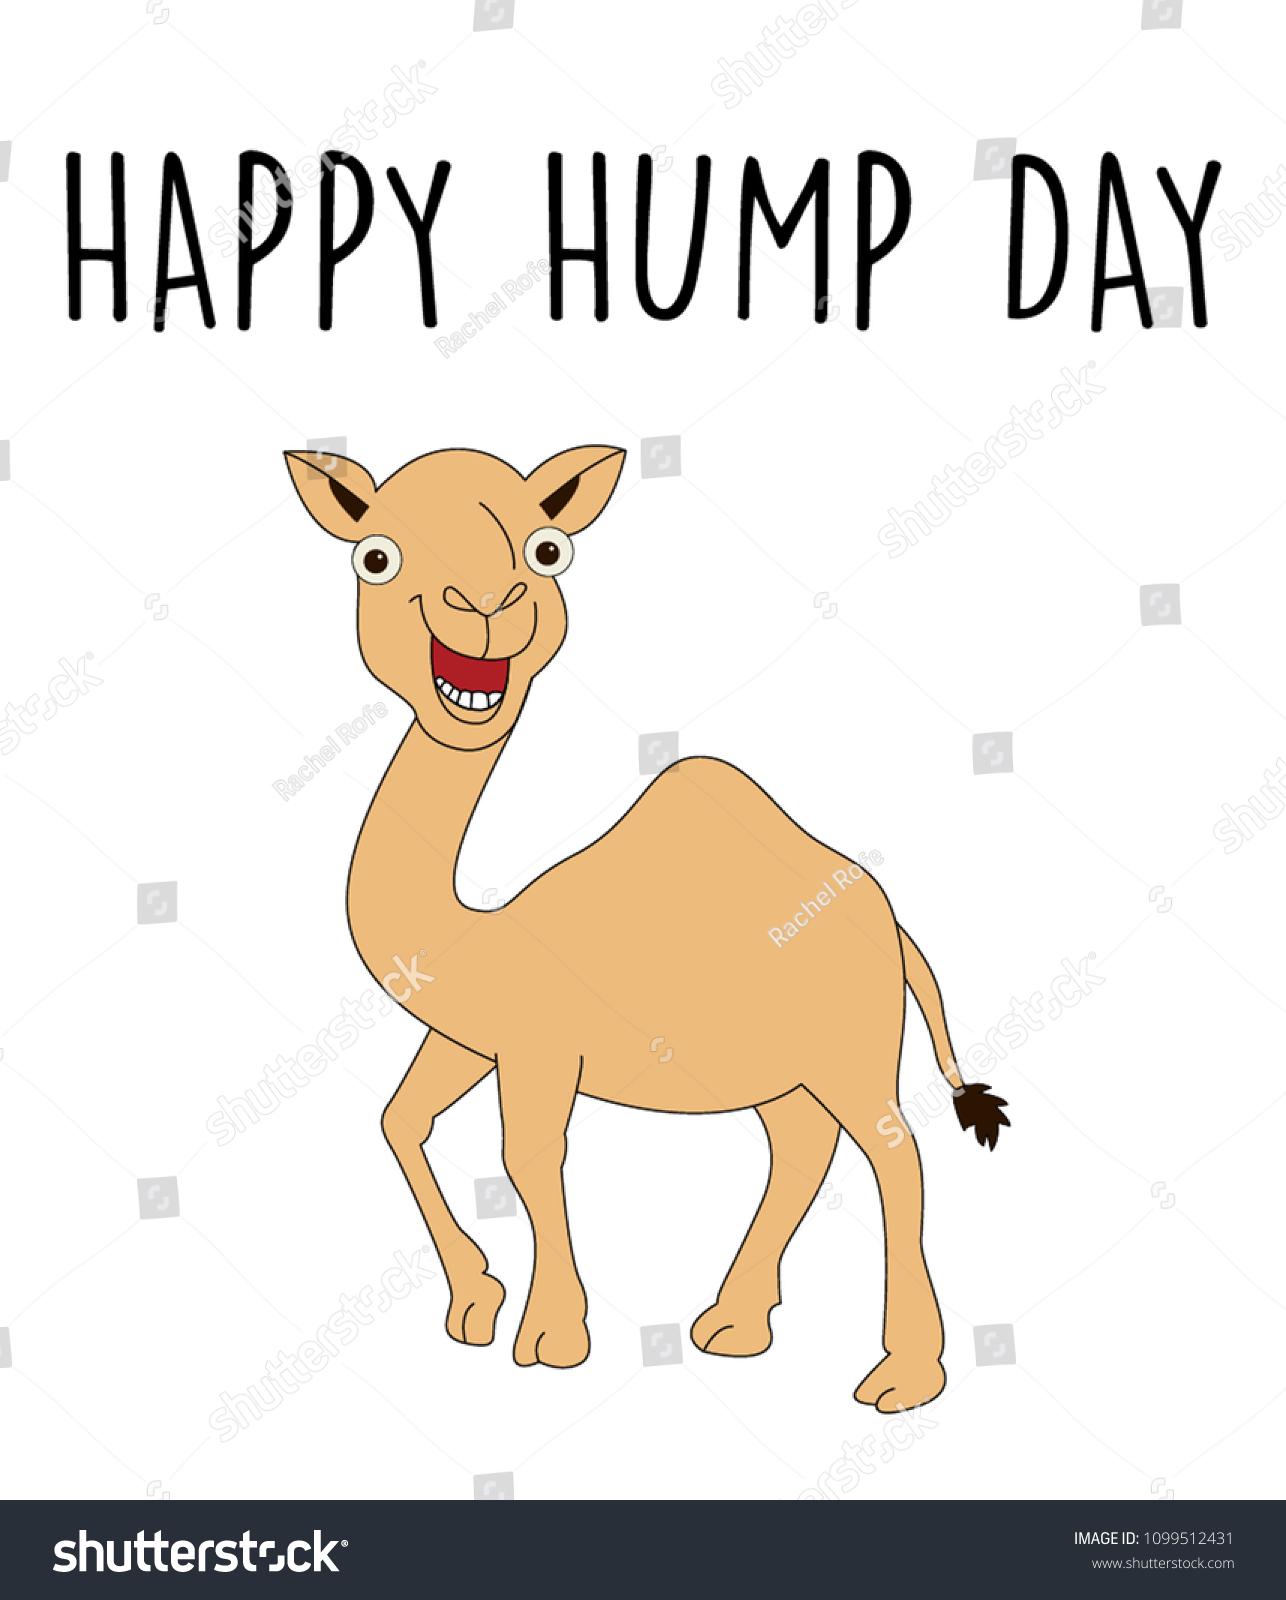 Stoner Girls Happy Hump Day - Stoner Pictures]